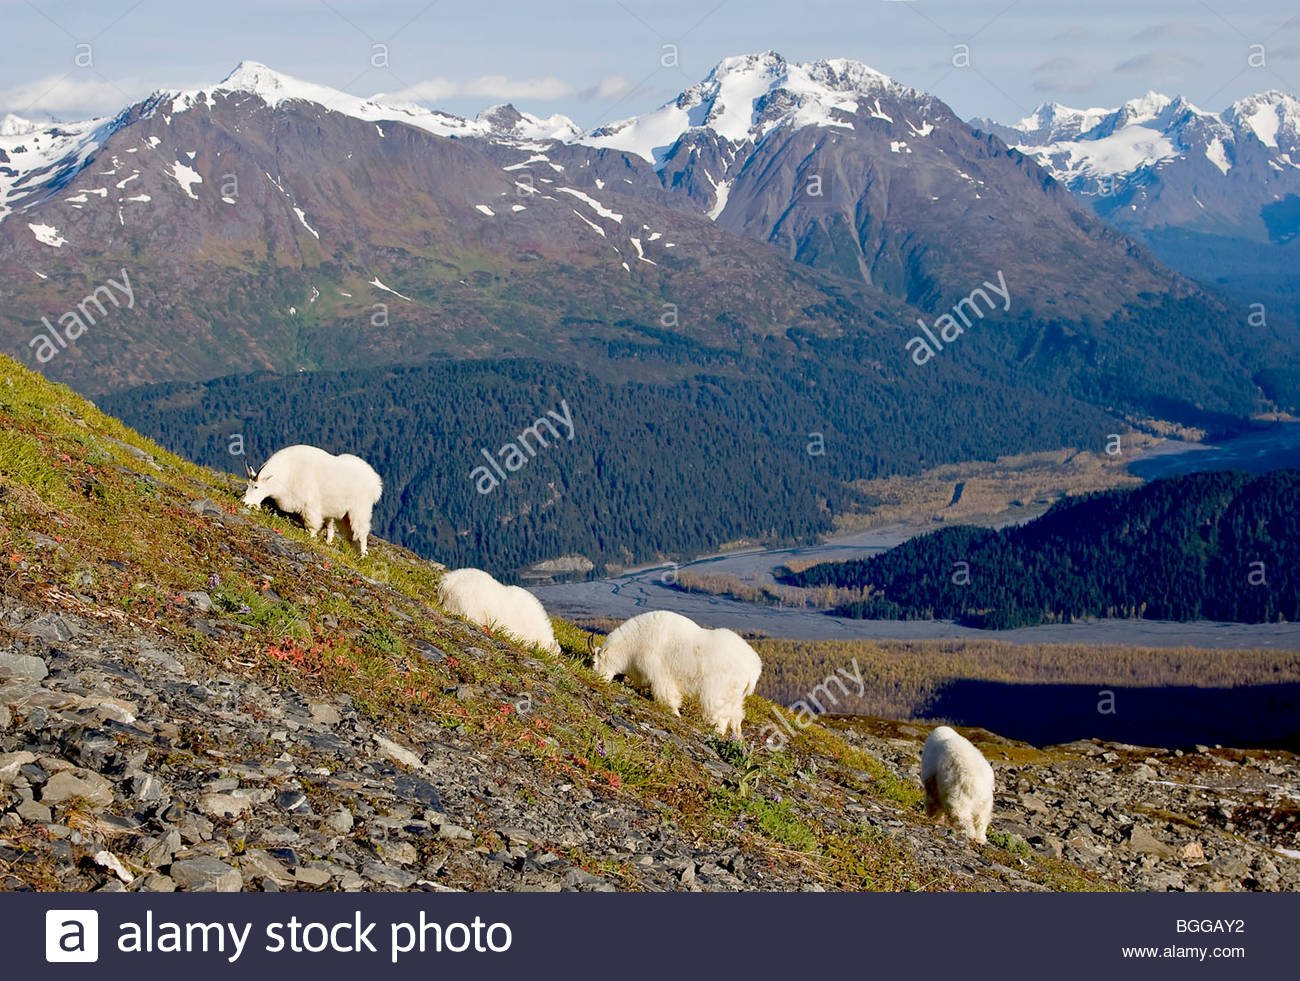 Alaska. Mounatin Goats (Oreamnos americanus) eating mountainside tundra grasses, Kenai Fjords National Park. - Stock Image